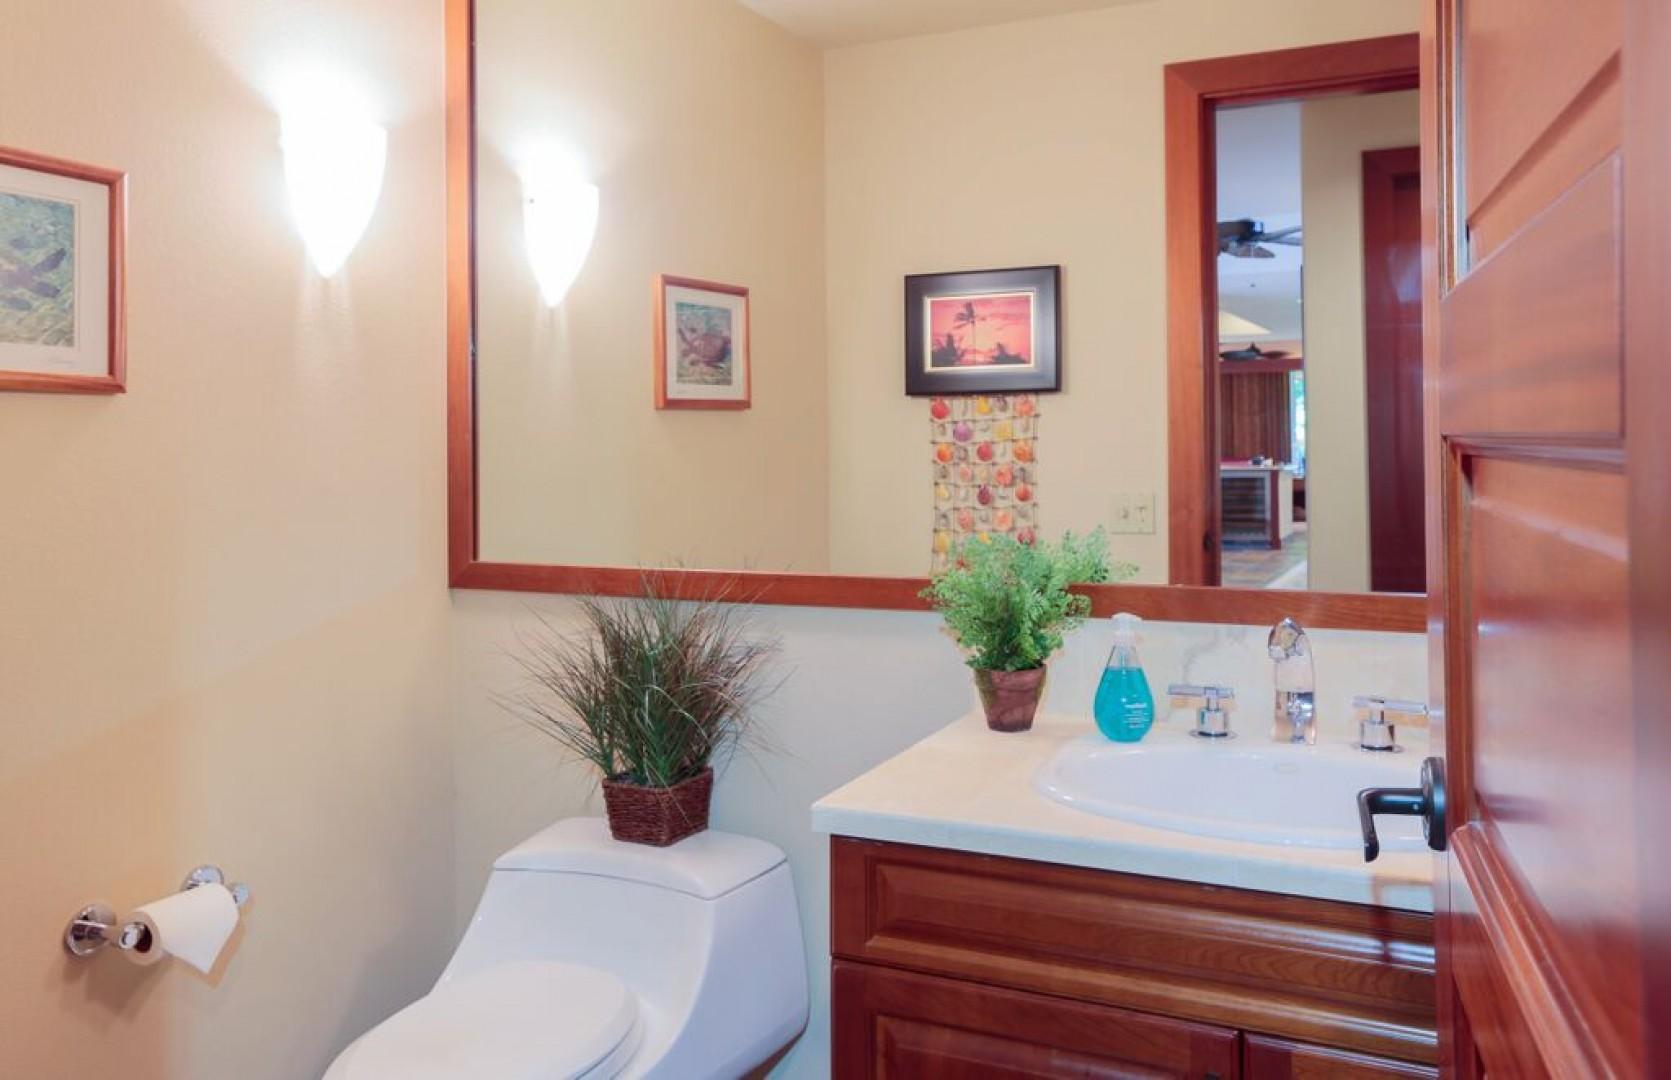 Third master en suite with walk-in shower